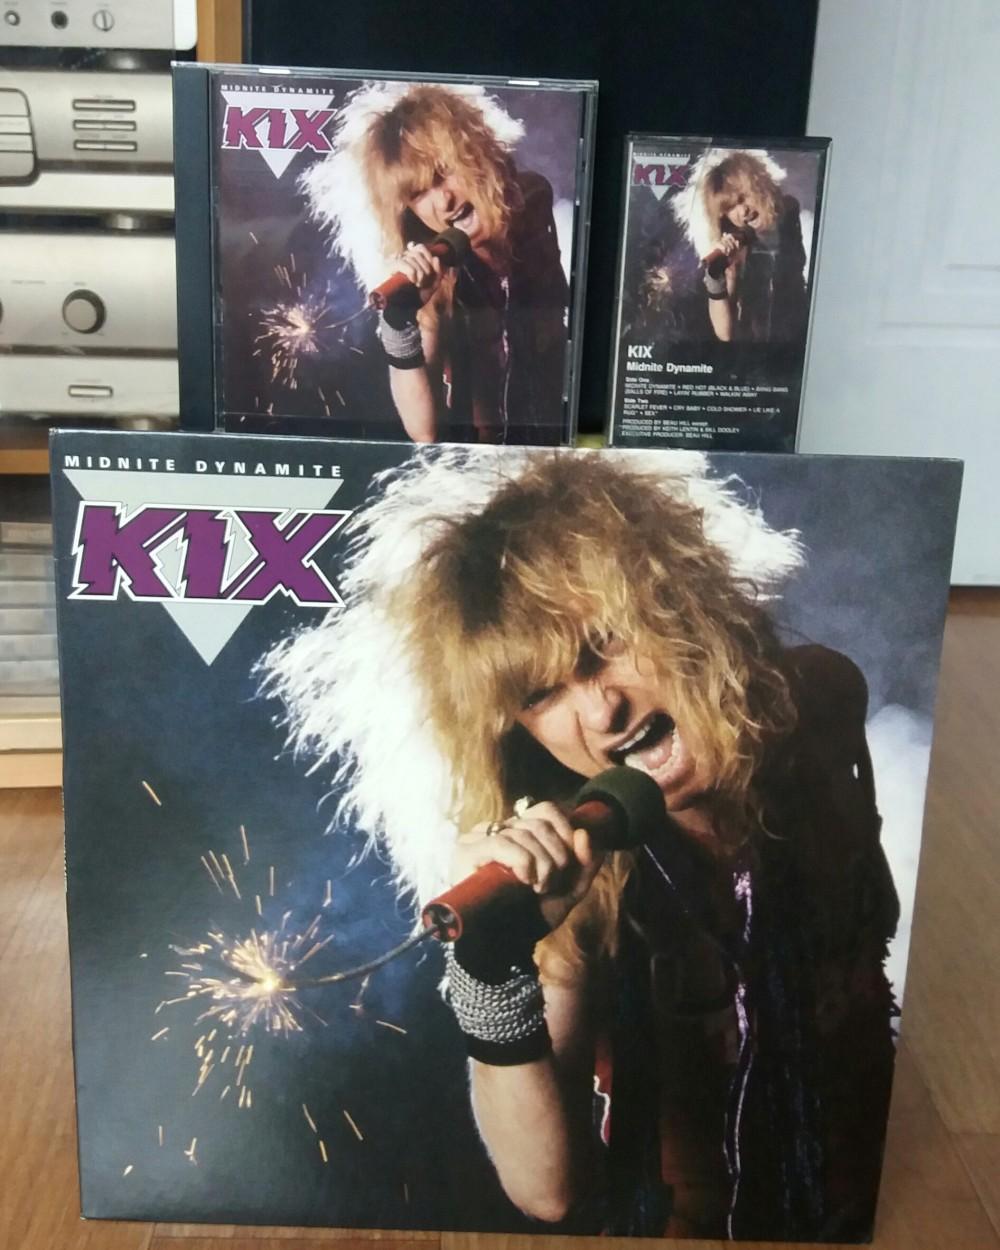 Kix - Midnite Dynamite Vinyl, CD